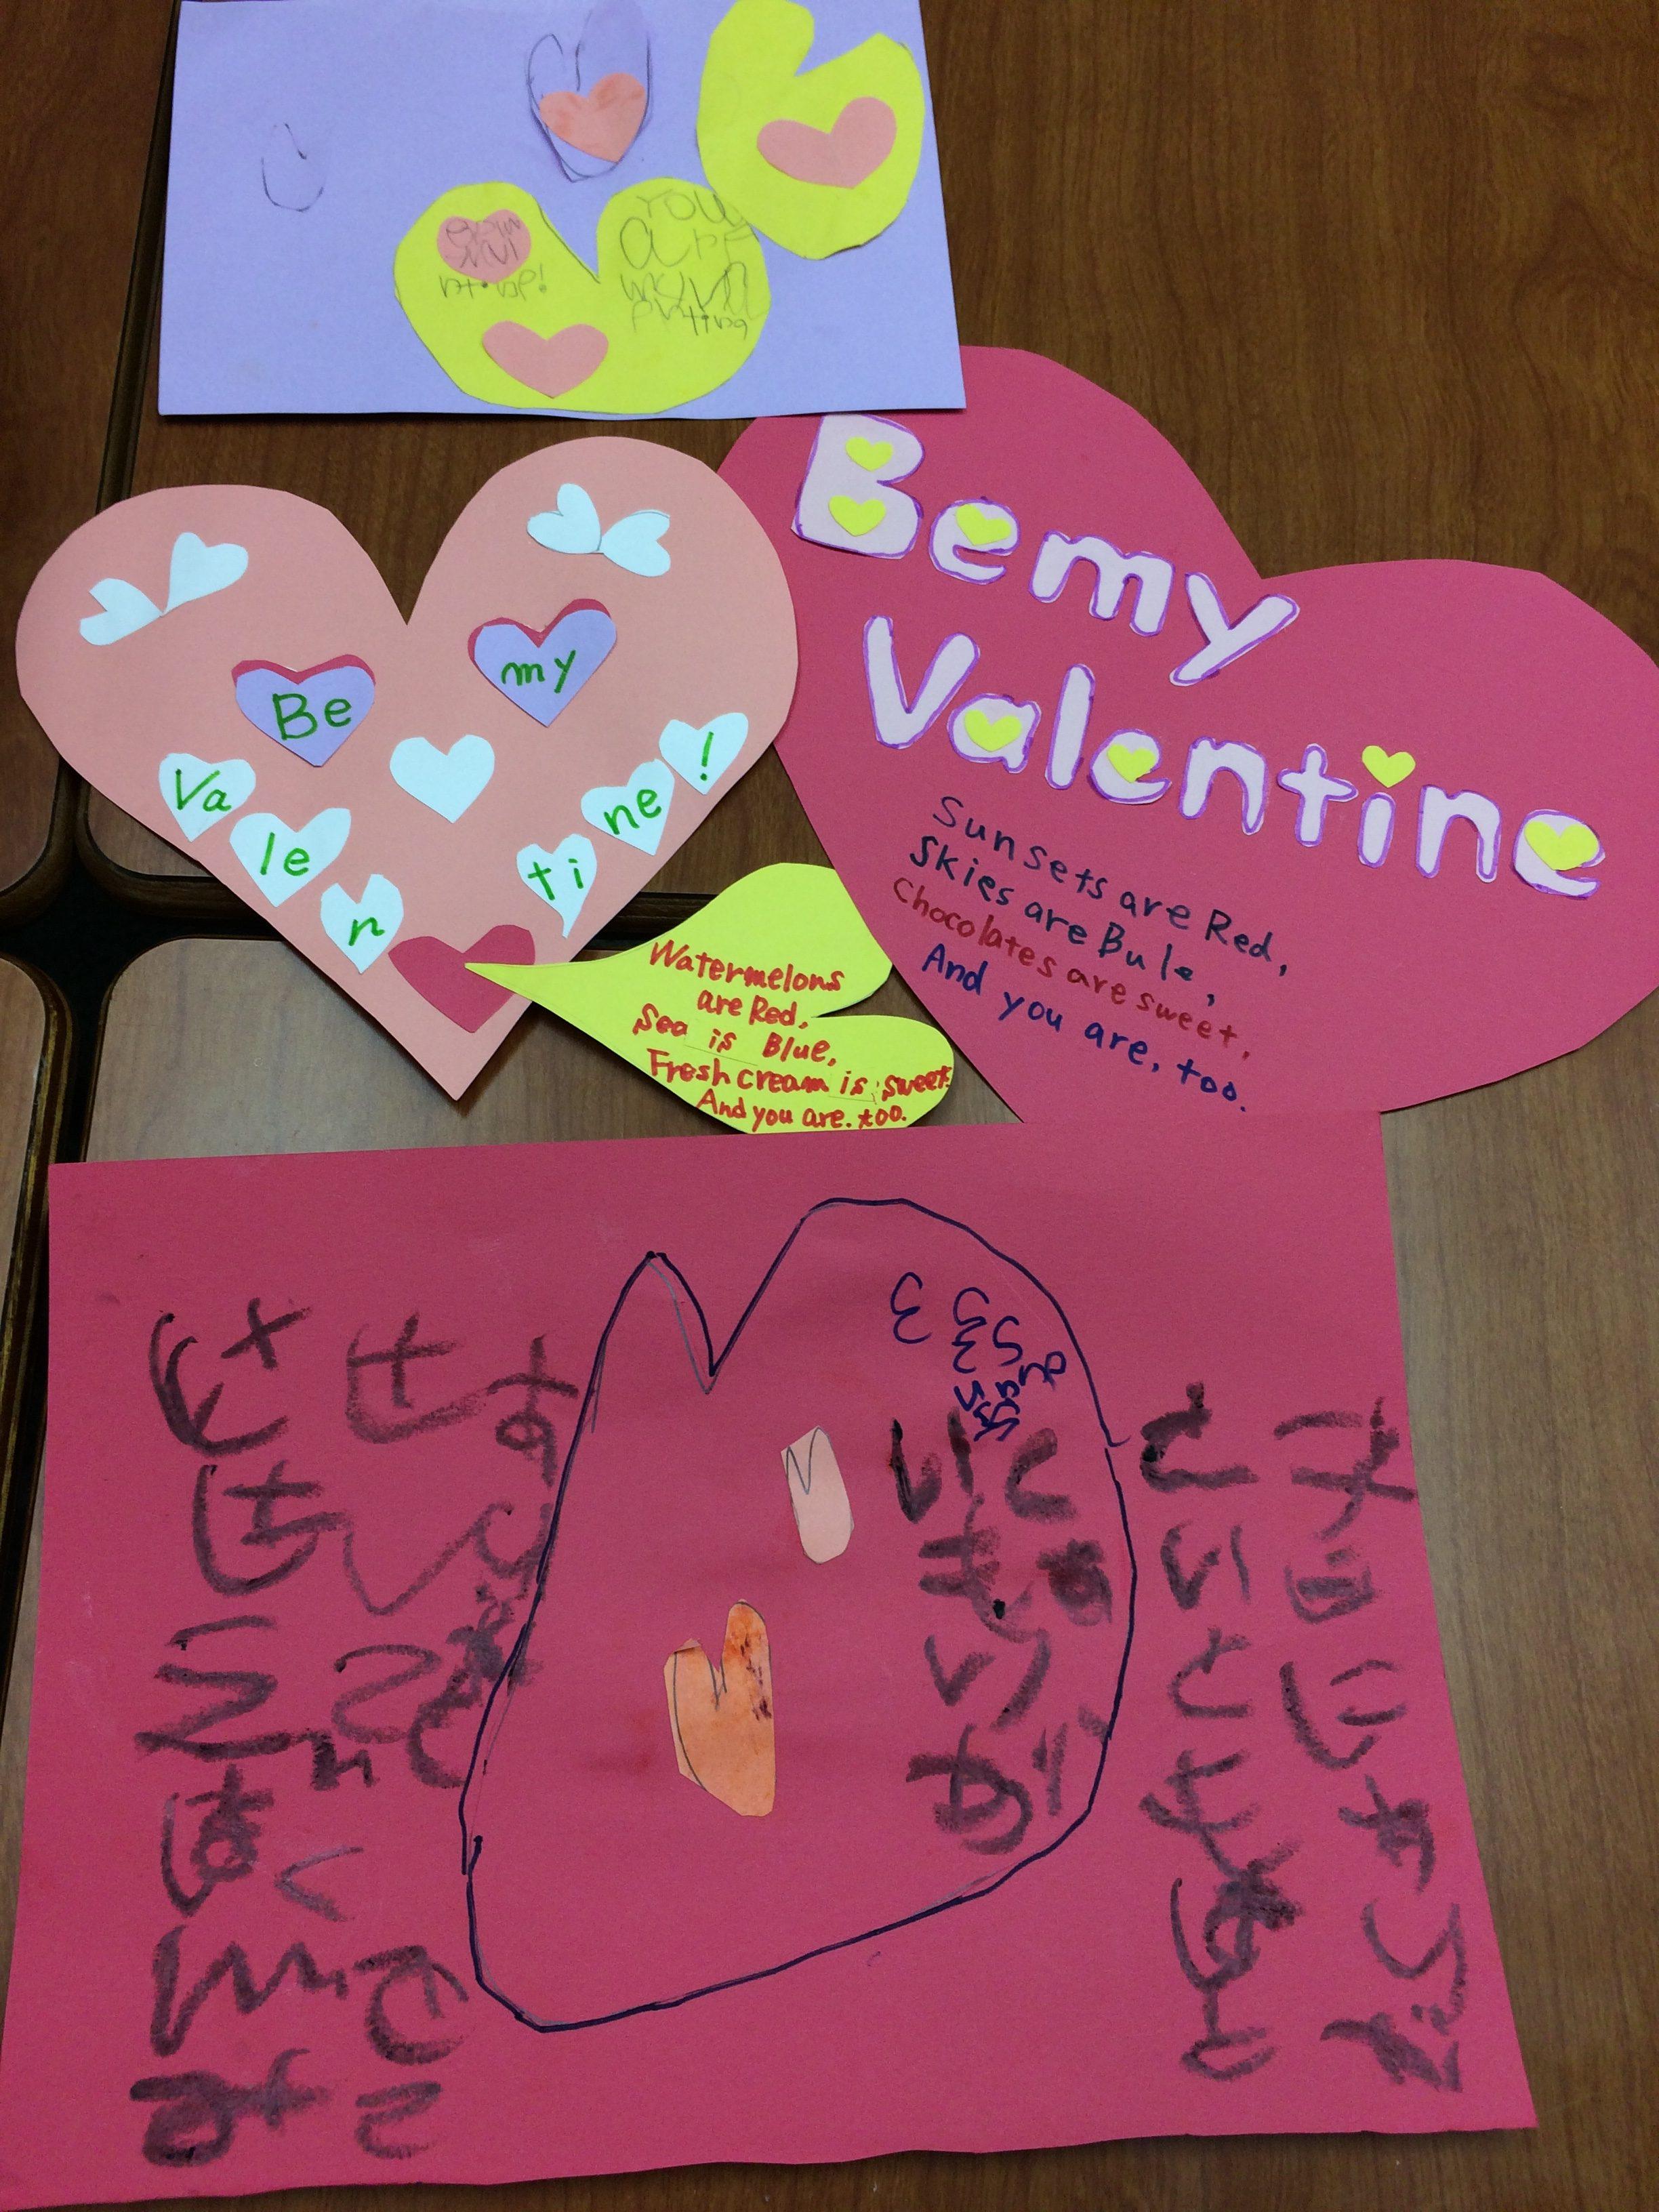 Be my Valentine! おうち英語スクール的バレンタインの楽しみ方